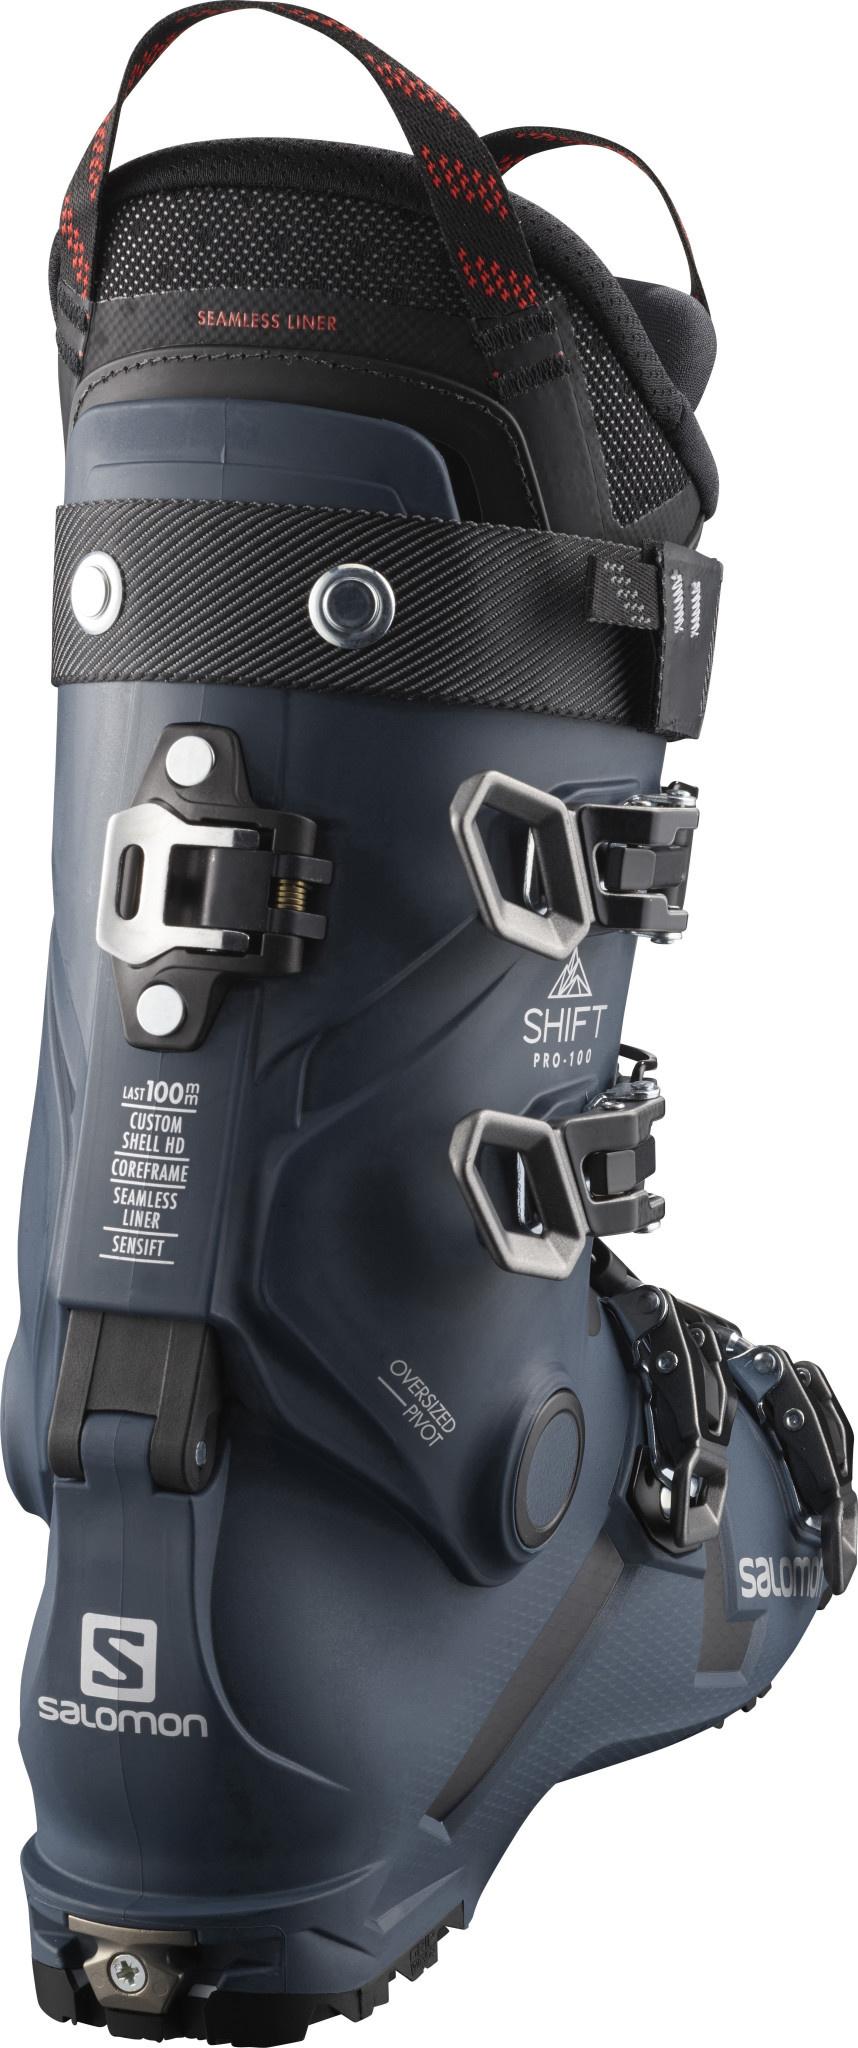 Salomon Shift Pro 100 At-2